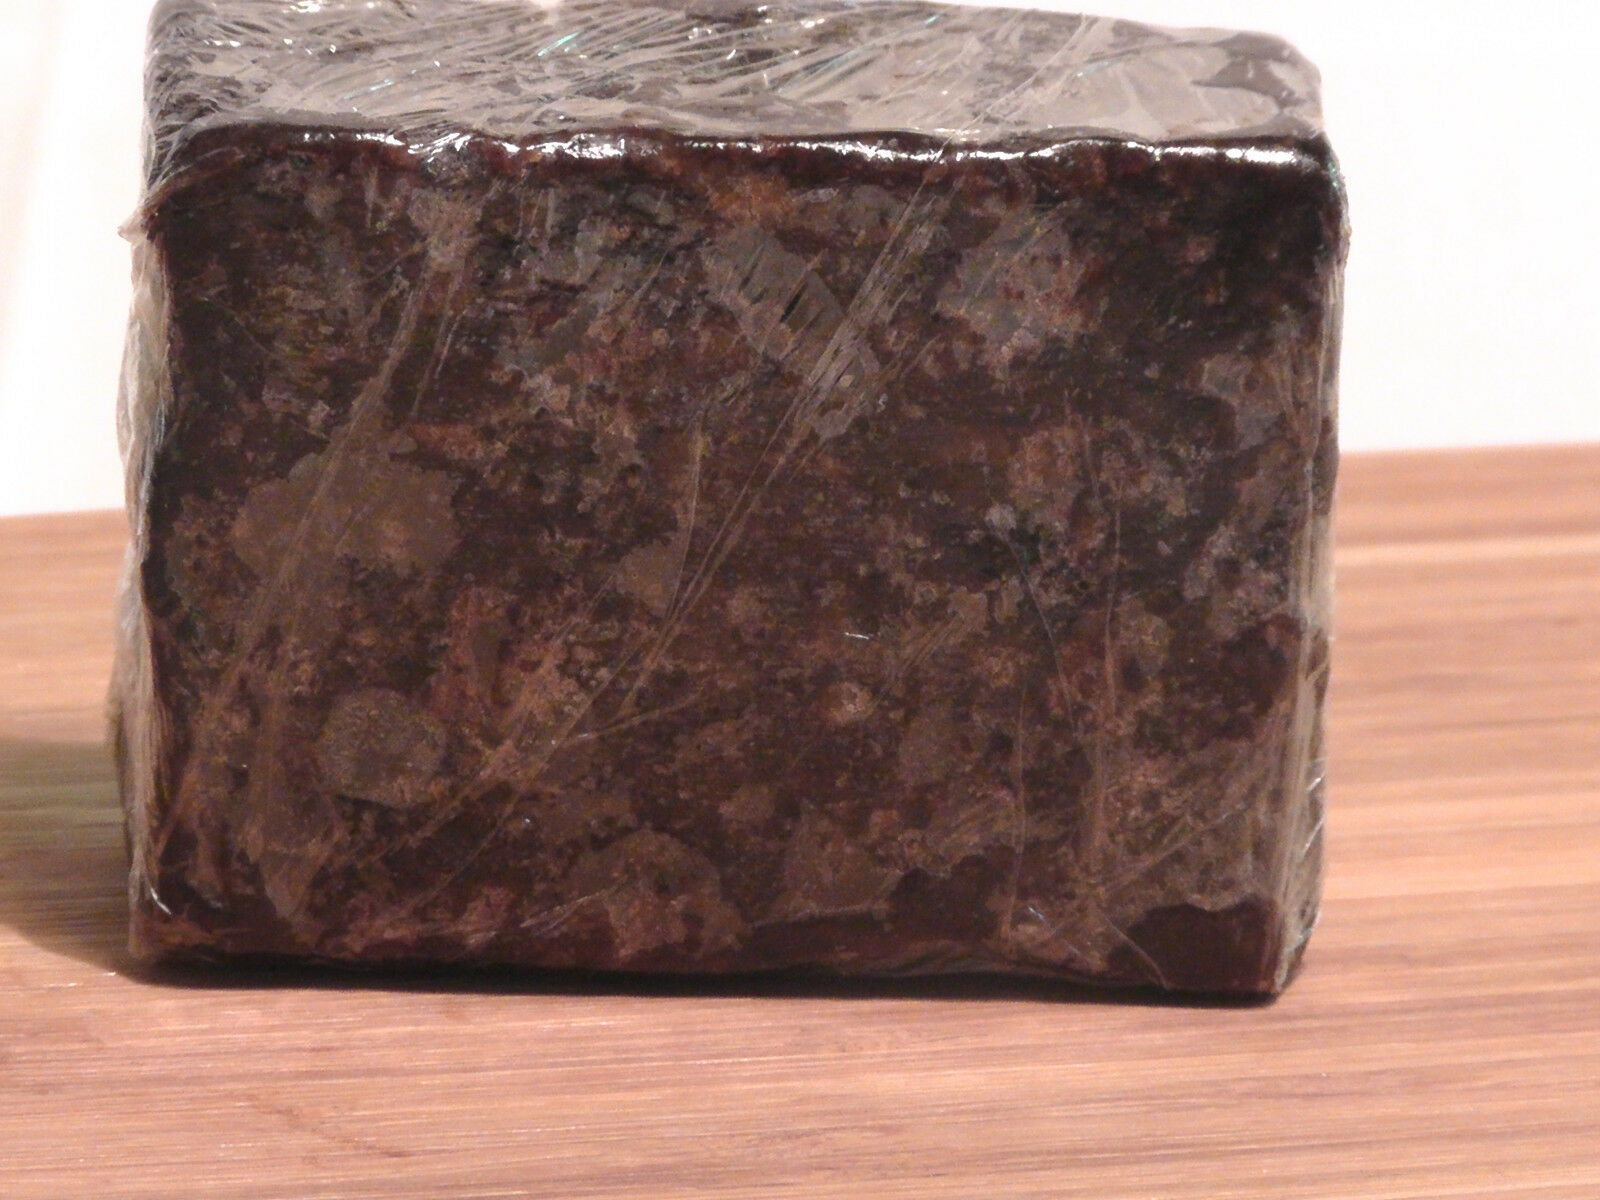 African Black Soap aus Ghana Naturseife, Vegan 100g + Schwarze Seife